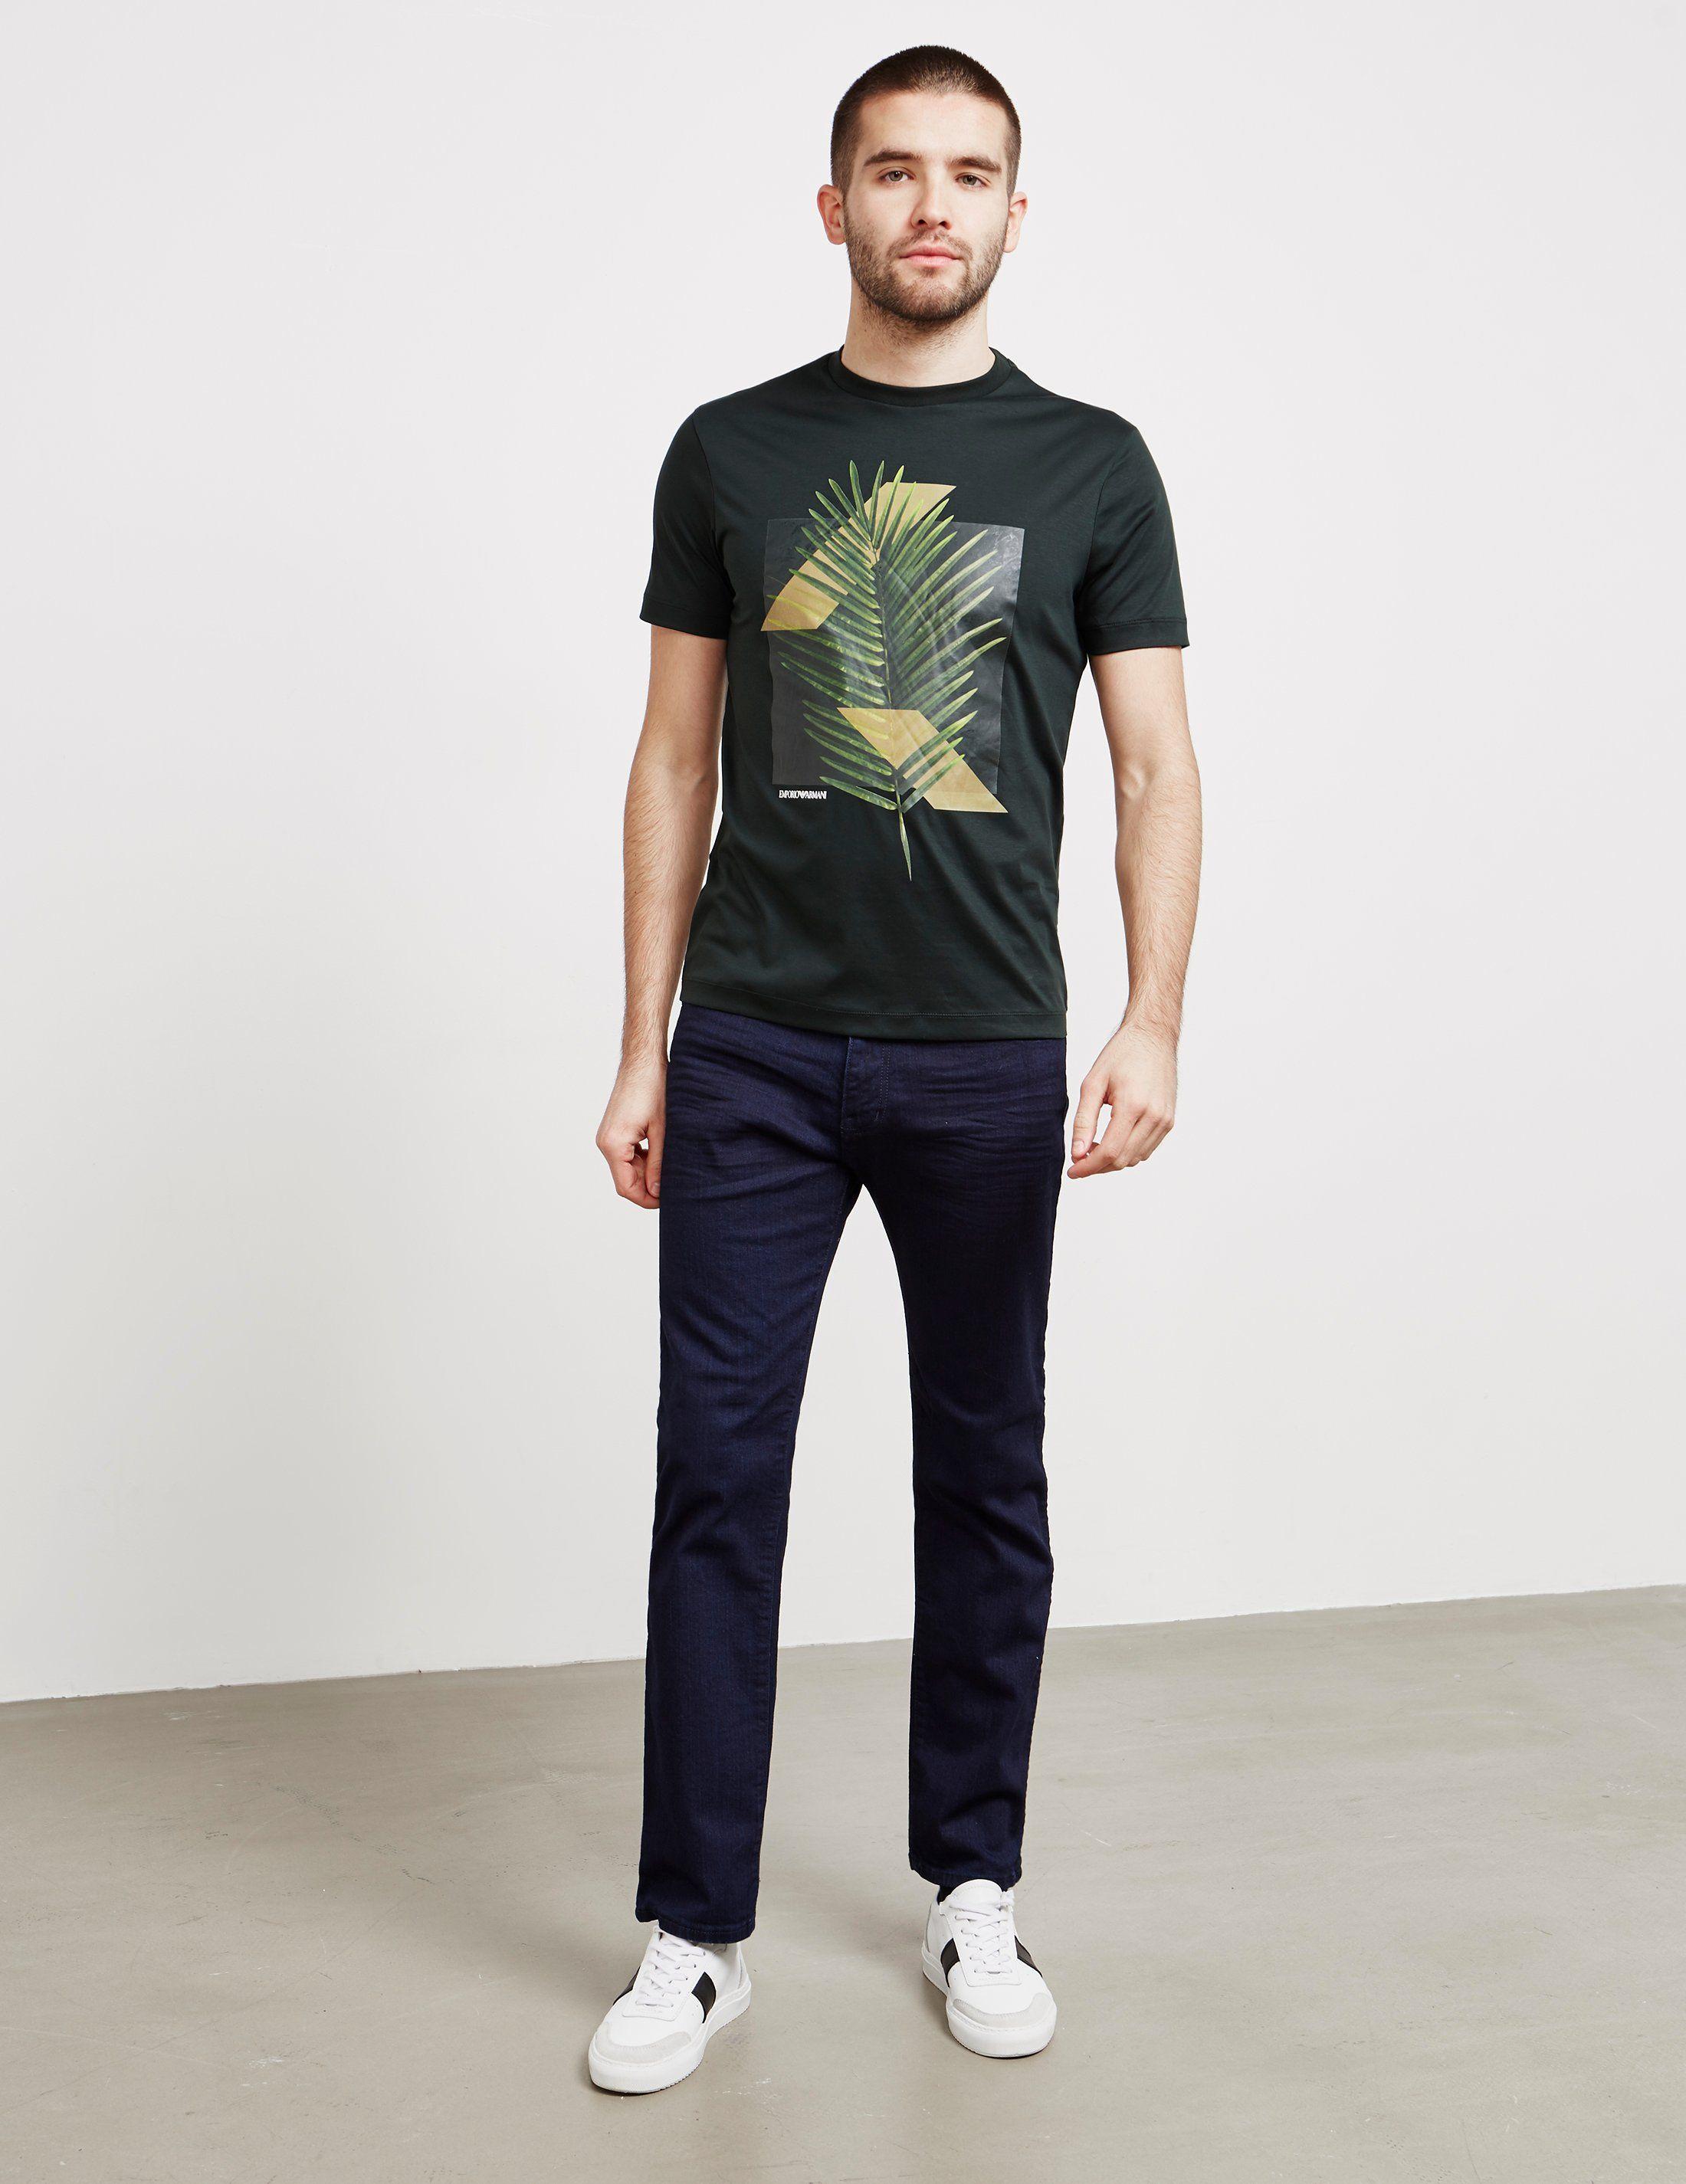 Emporio Armani Palm Print Short Sleeve T-Shirt - Online Exclusive